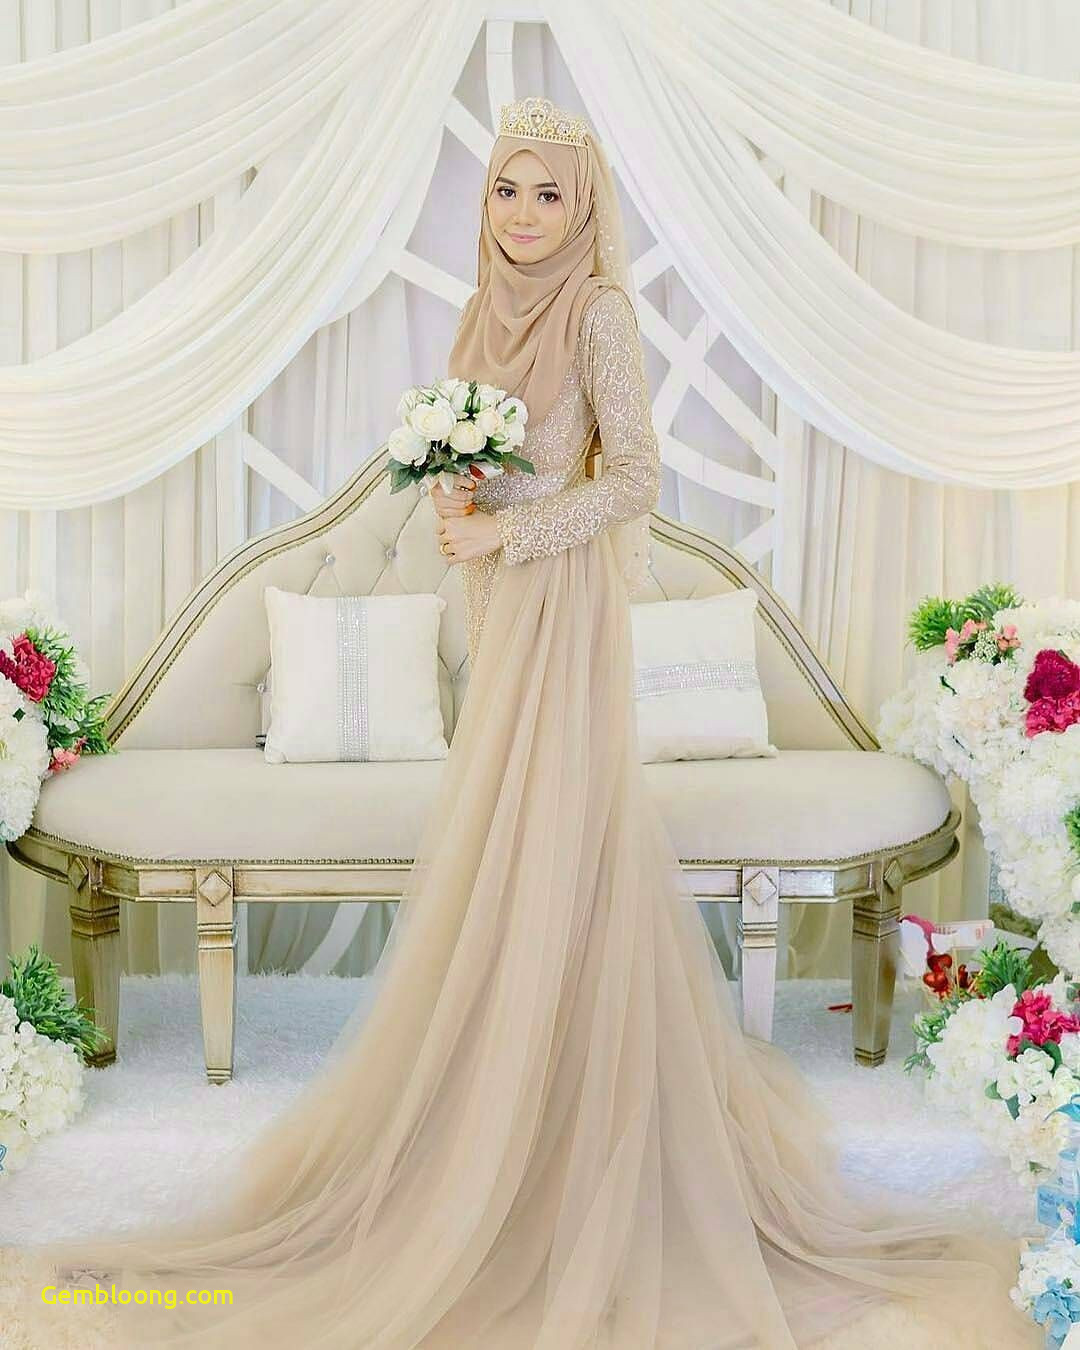 Gaun Sederhana Pengantin Berhijab Beautiful 13 Inspirasi Gaun Pengantin Melayu Untukmu Yang Berhijab